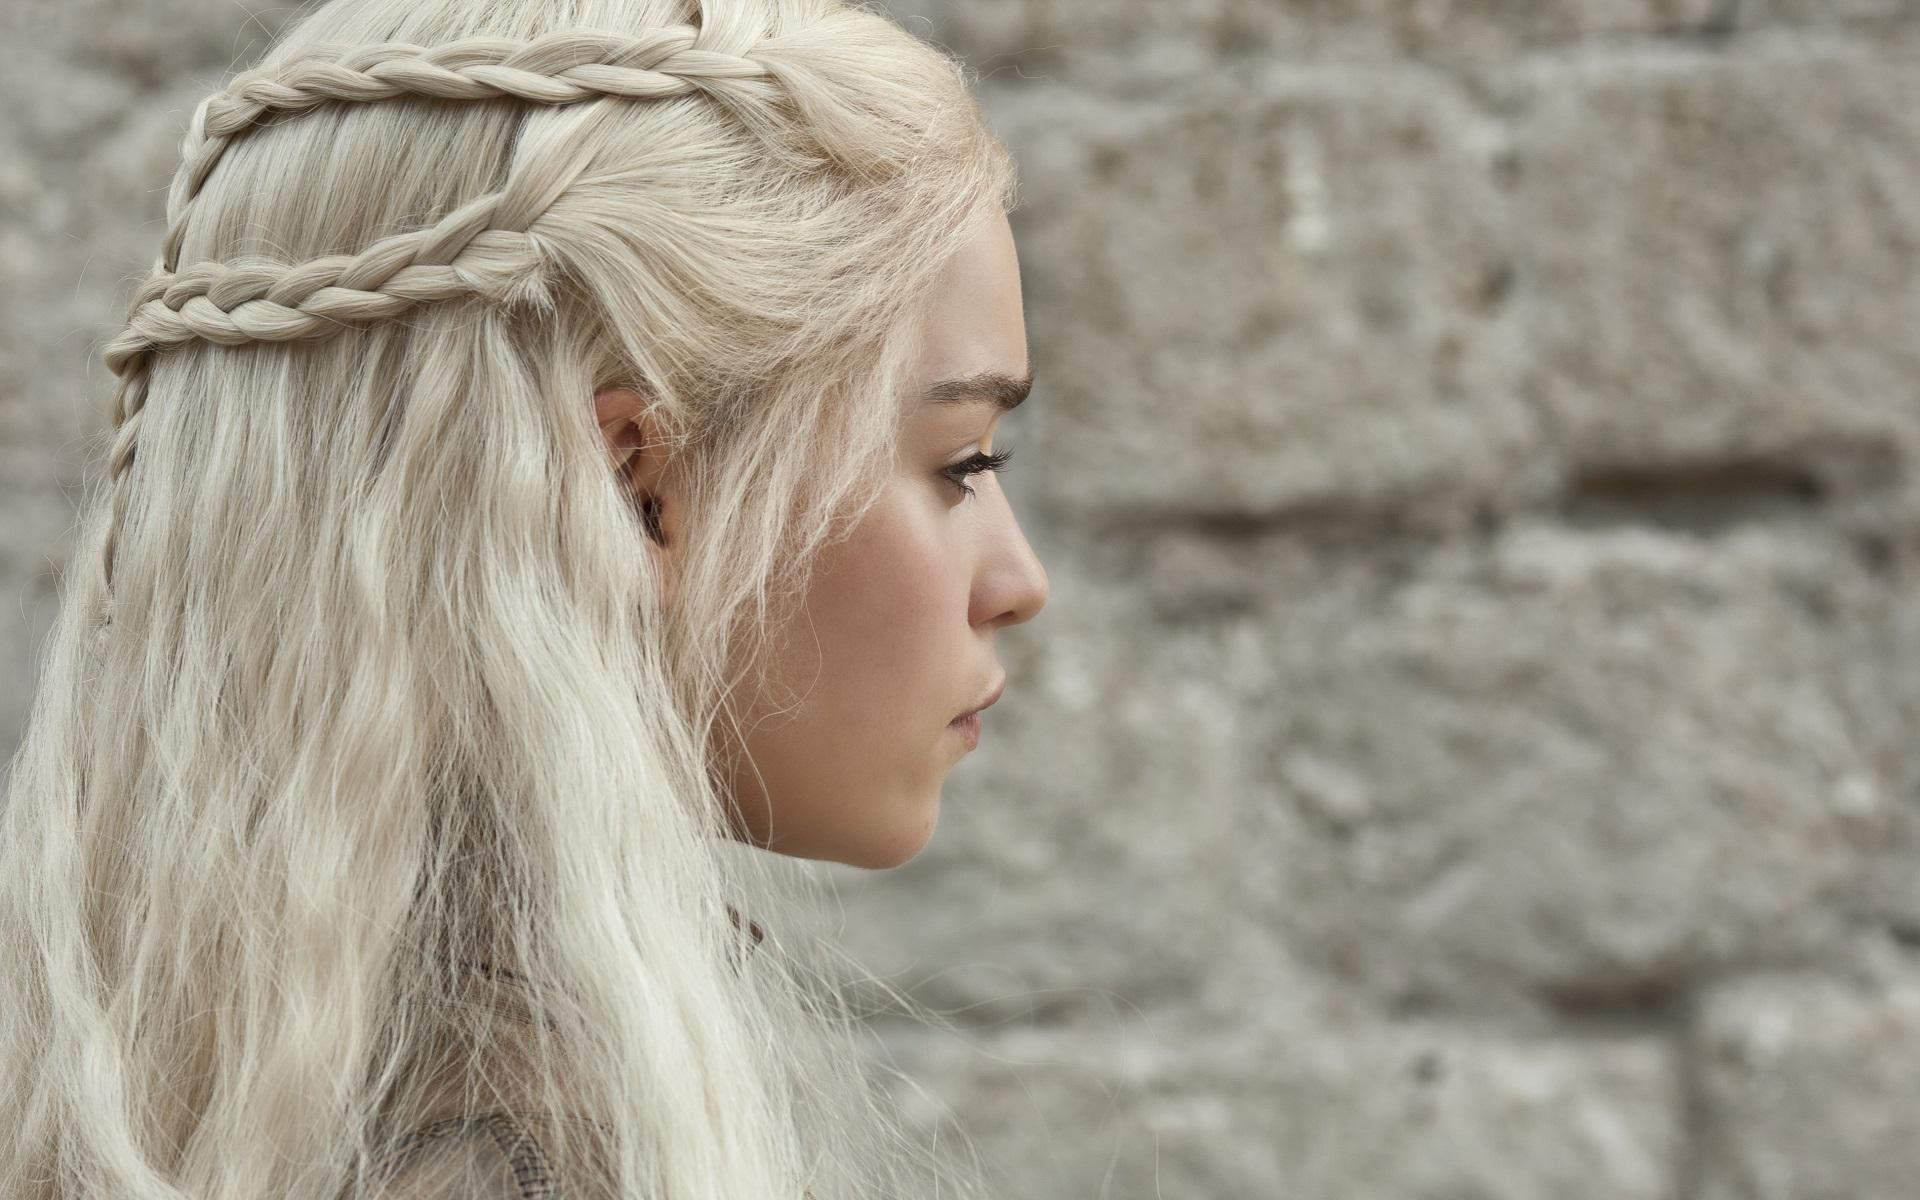 Hintergrundbilder Daenerys Targaryen Emilia Clarke Frau